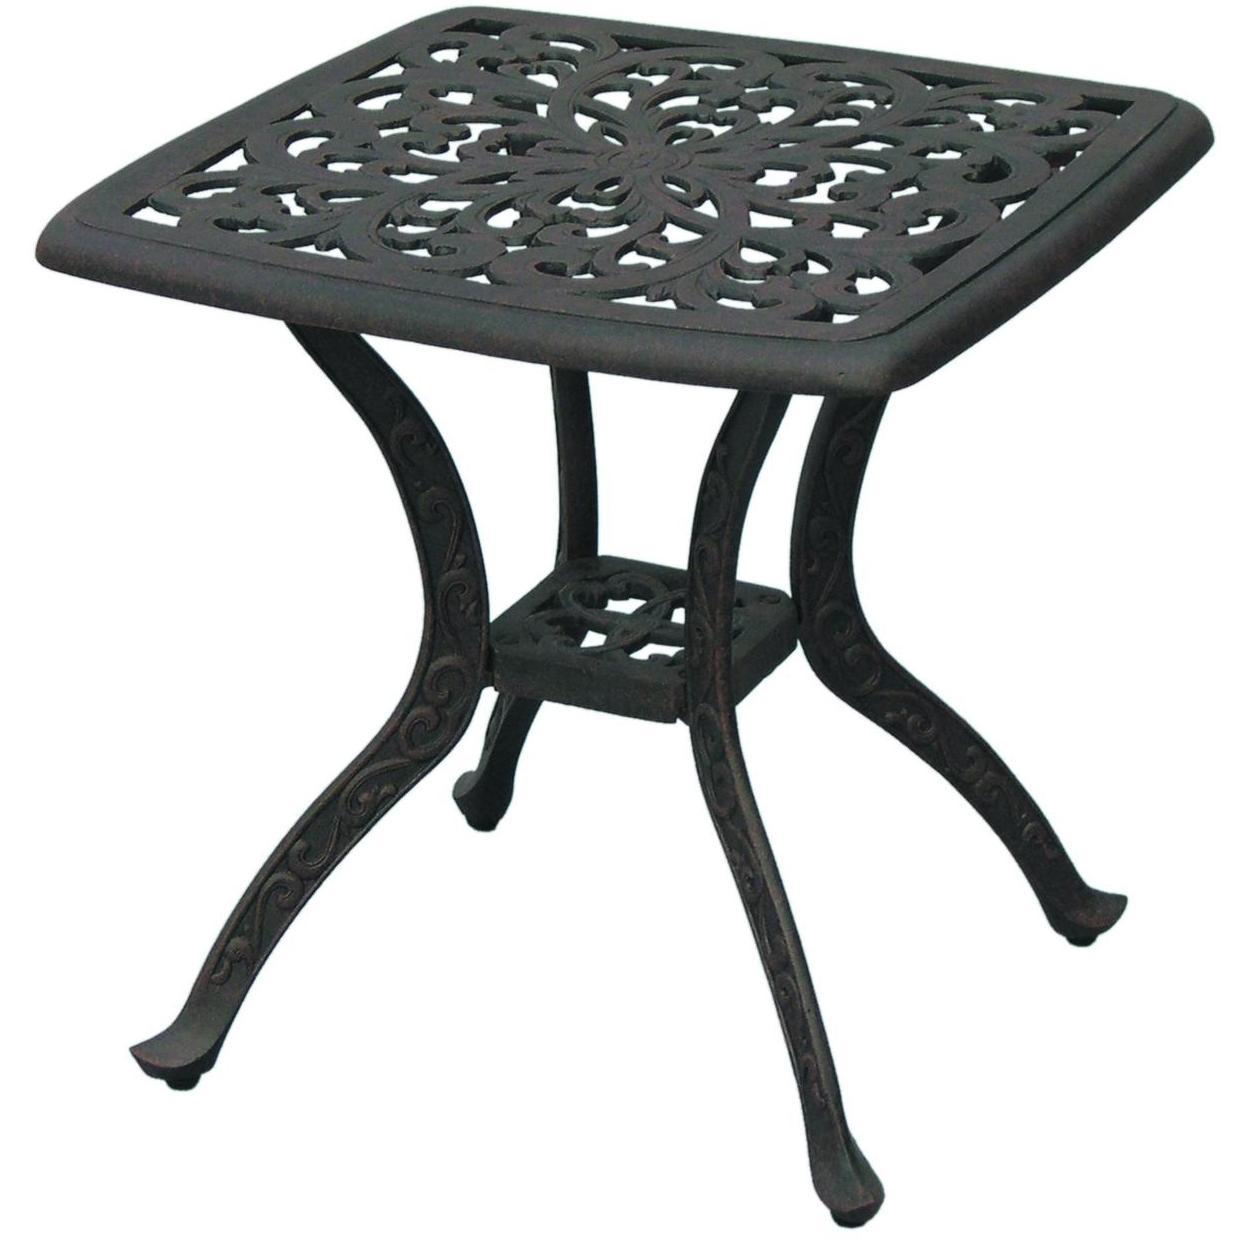 Darlee Catalina Cast Aluminum Outdoor Patio End Table - 21 Inch Square - Antique Bronze